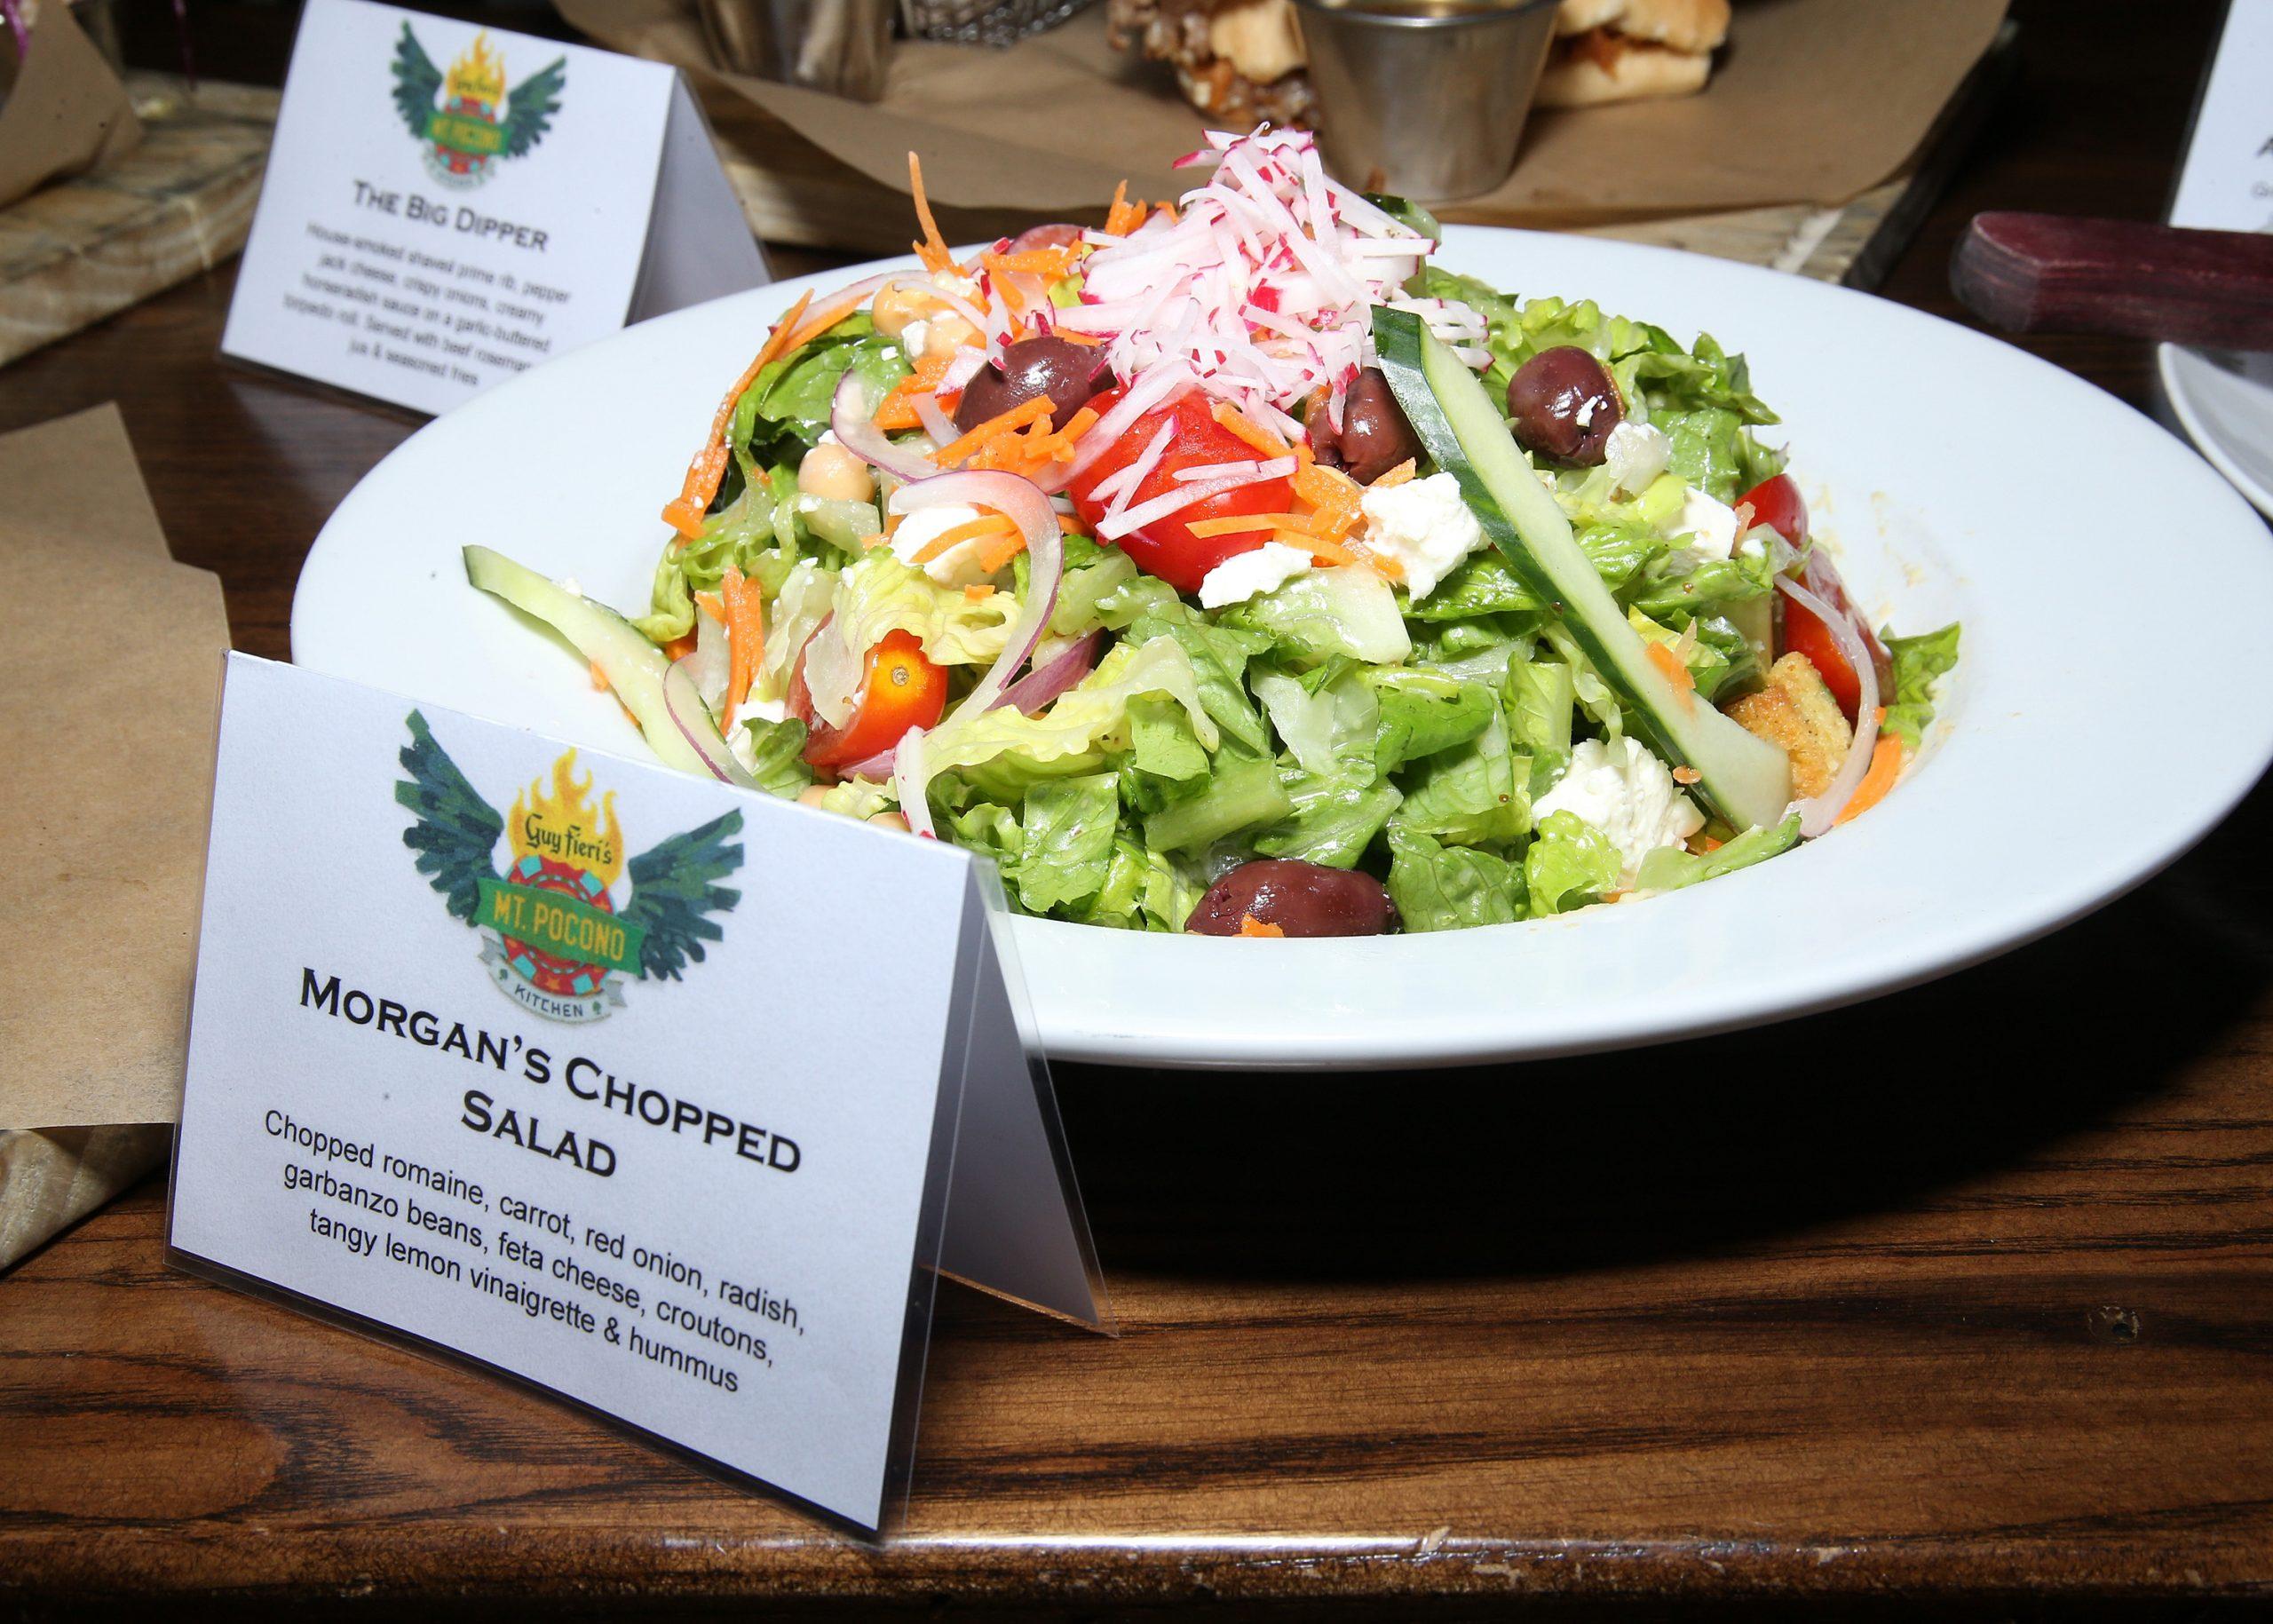 Mount Airy Casino Guy Fieri Morgan's Chopped Salad